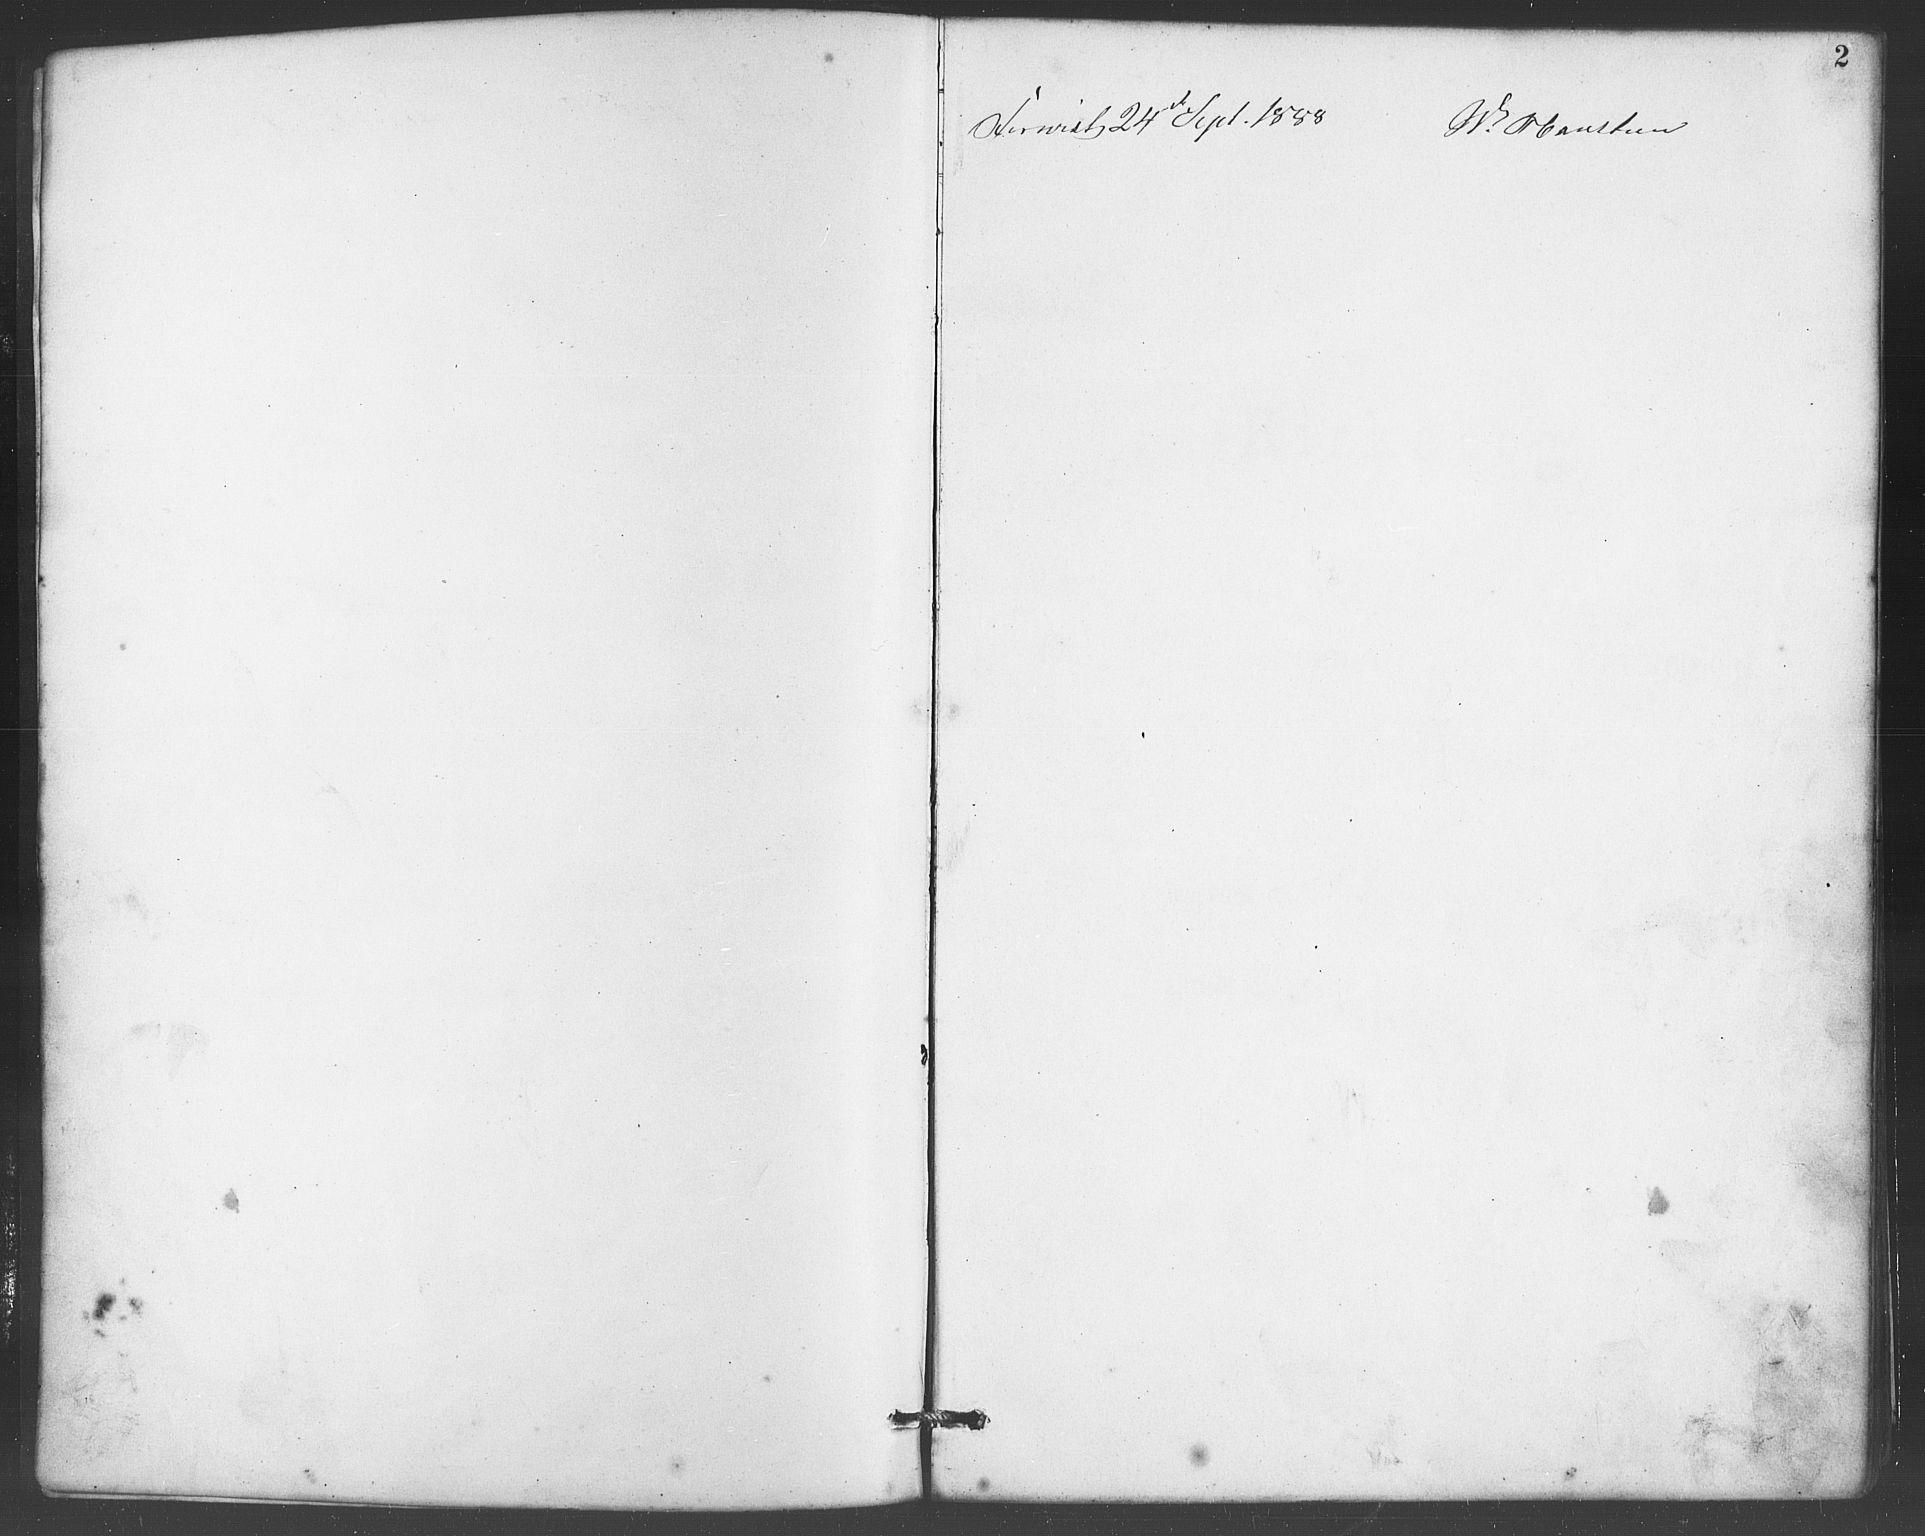 SAB, Evanger sokneprestembete*, Parish register (copy) no. A 4, 1887-1897, p. 2